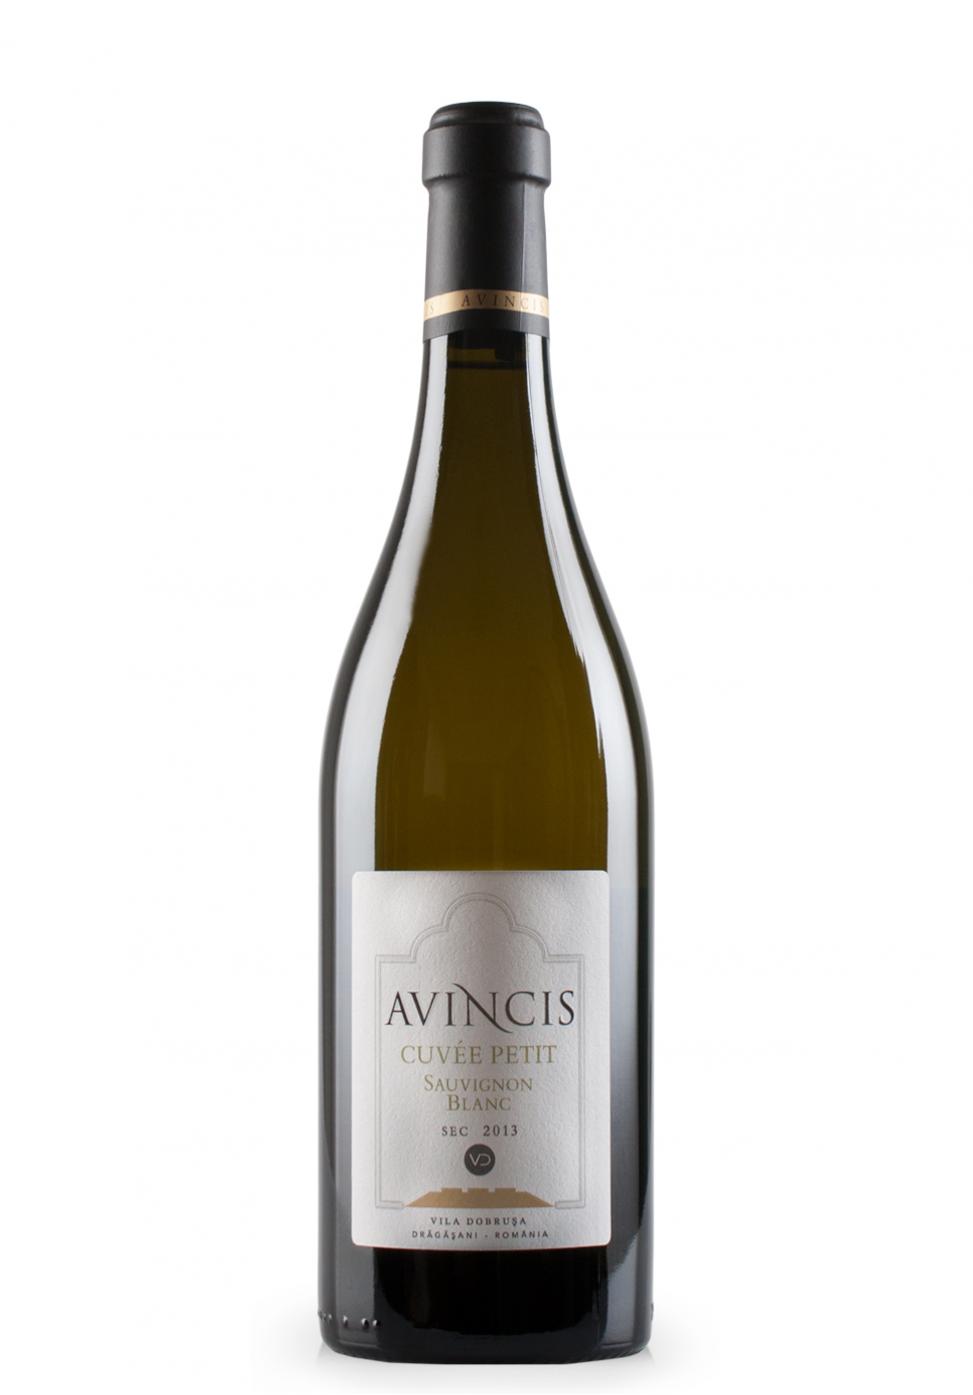 Vin Avincis Vila Dobrusa, Cuvée Petit, Sauvignon Blanc, 2013 (0.75L)